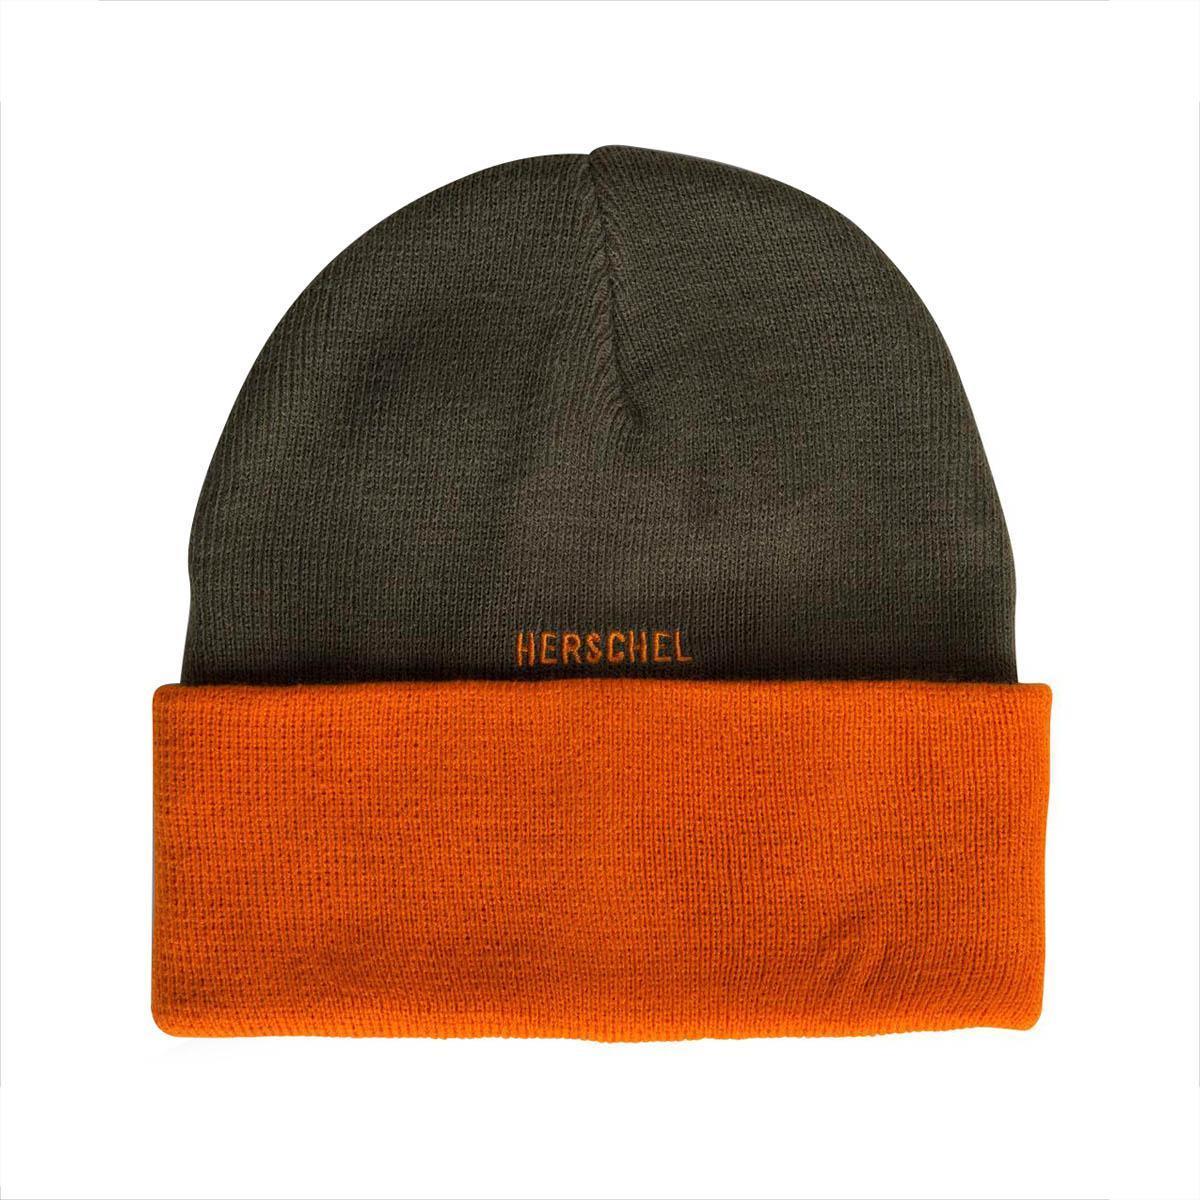 Lyst - Herschel Supply Co. Rosewell Ivy Green   Orange Beanie in ... 2609e02b5217